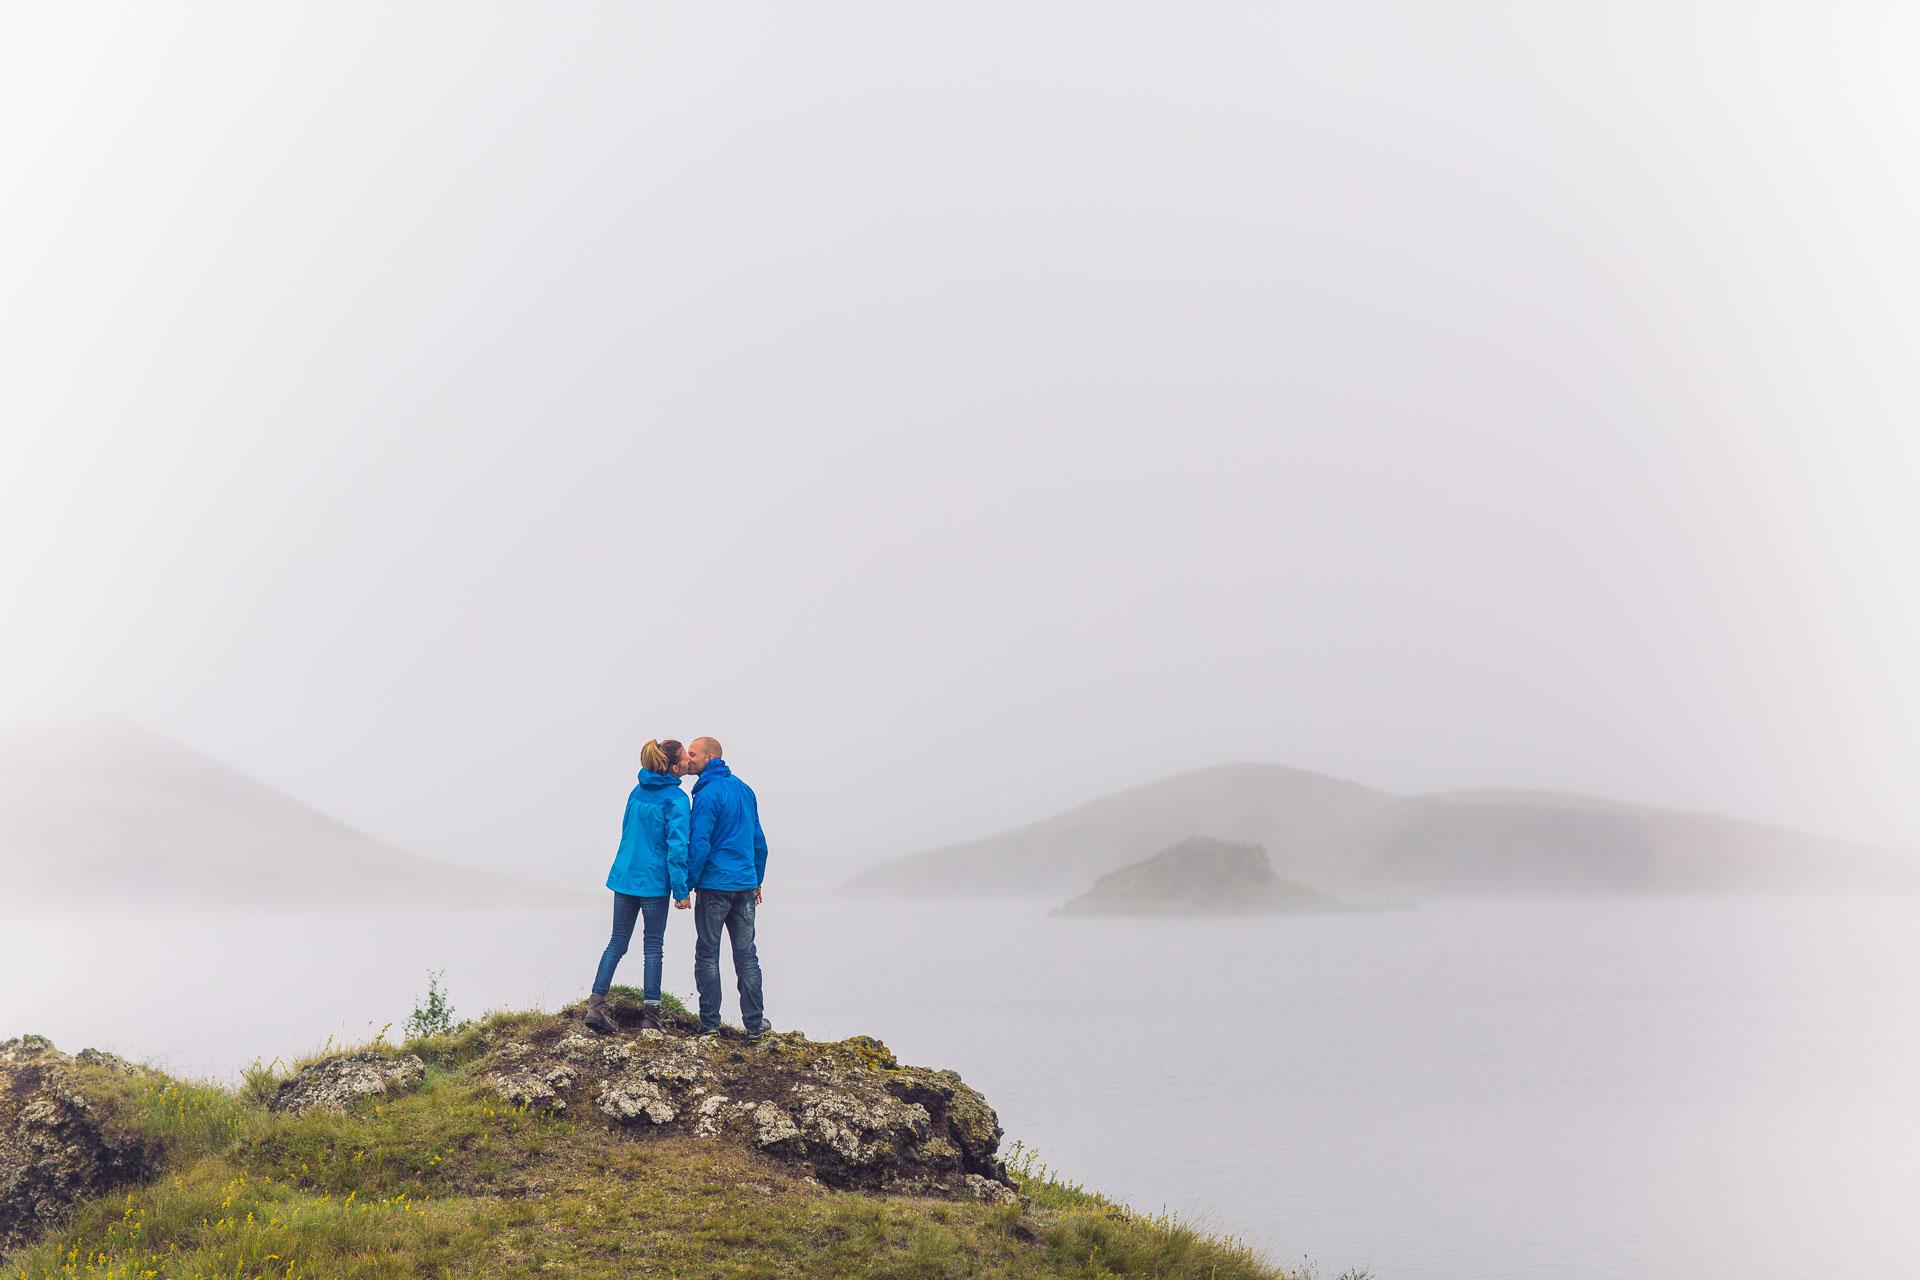 Wedding engagement session / Pre shoot, Iceland - Bröllop provfotografering / förlovningsfotografering, Island